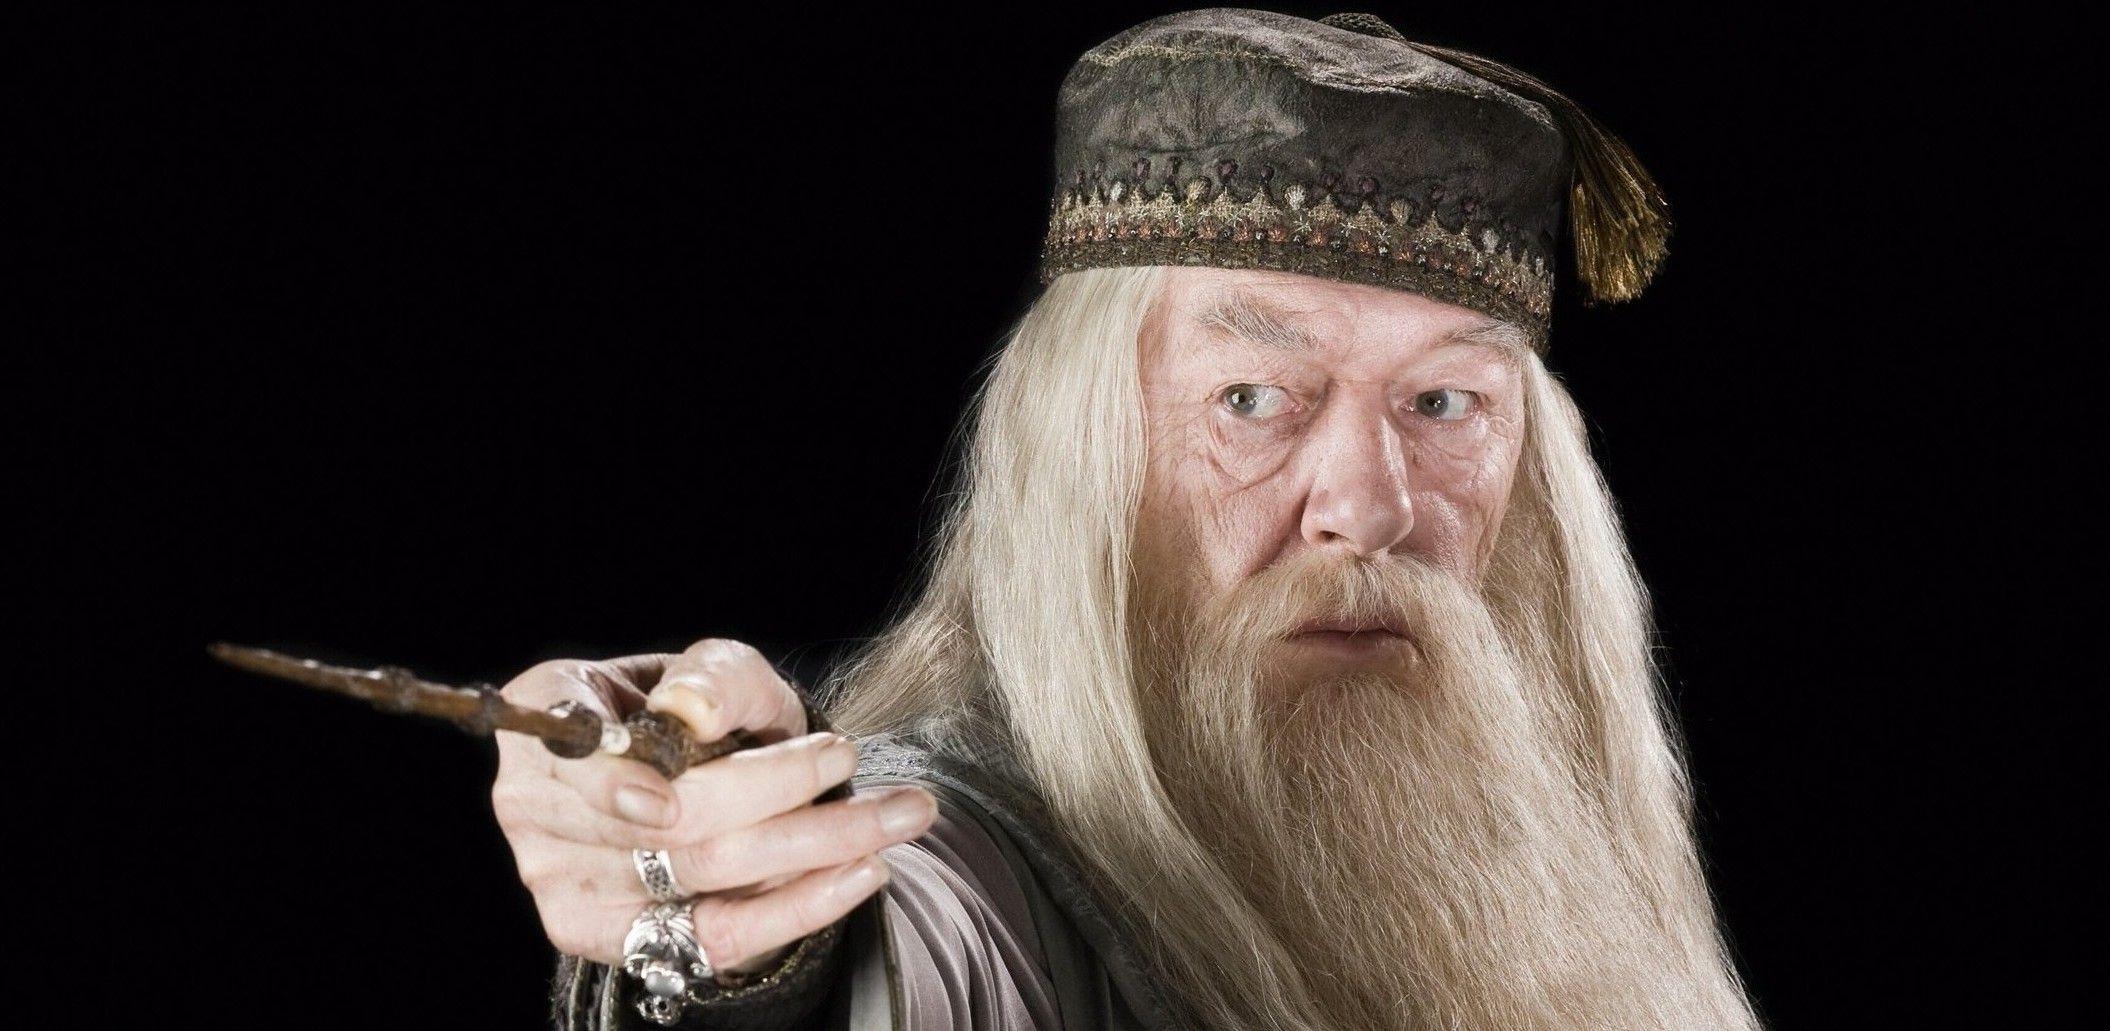 I Like Dumbledore S Ring On His Ring Finger Dumbledore Zitate Zauberer Albus Dumbledore